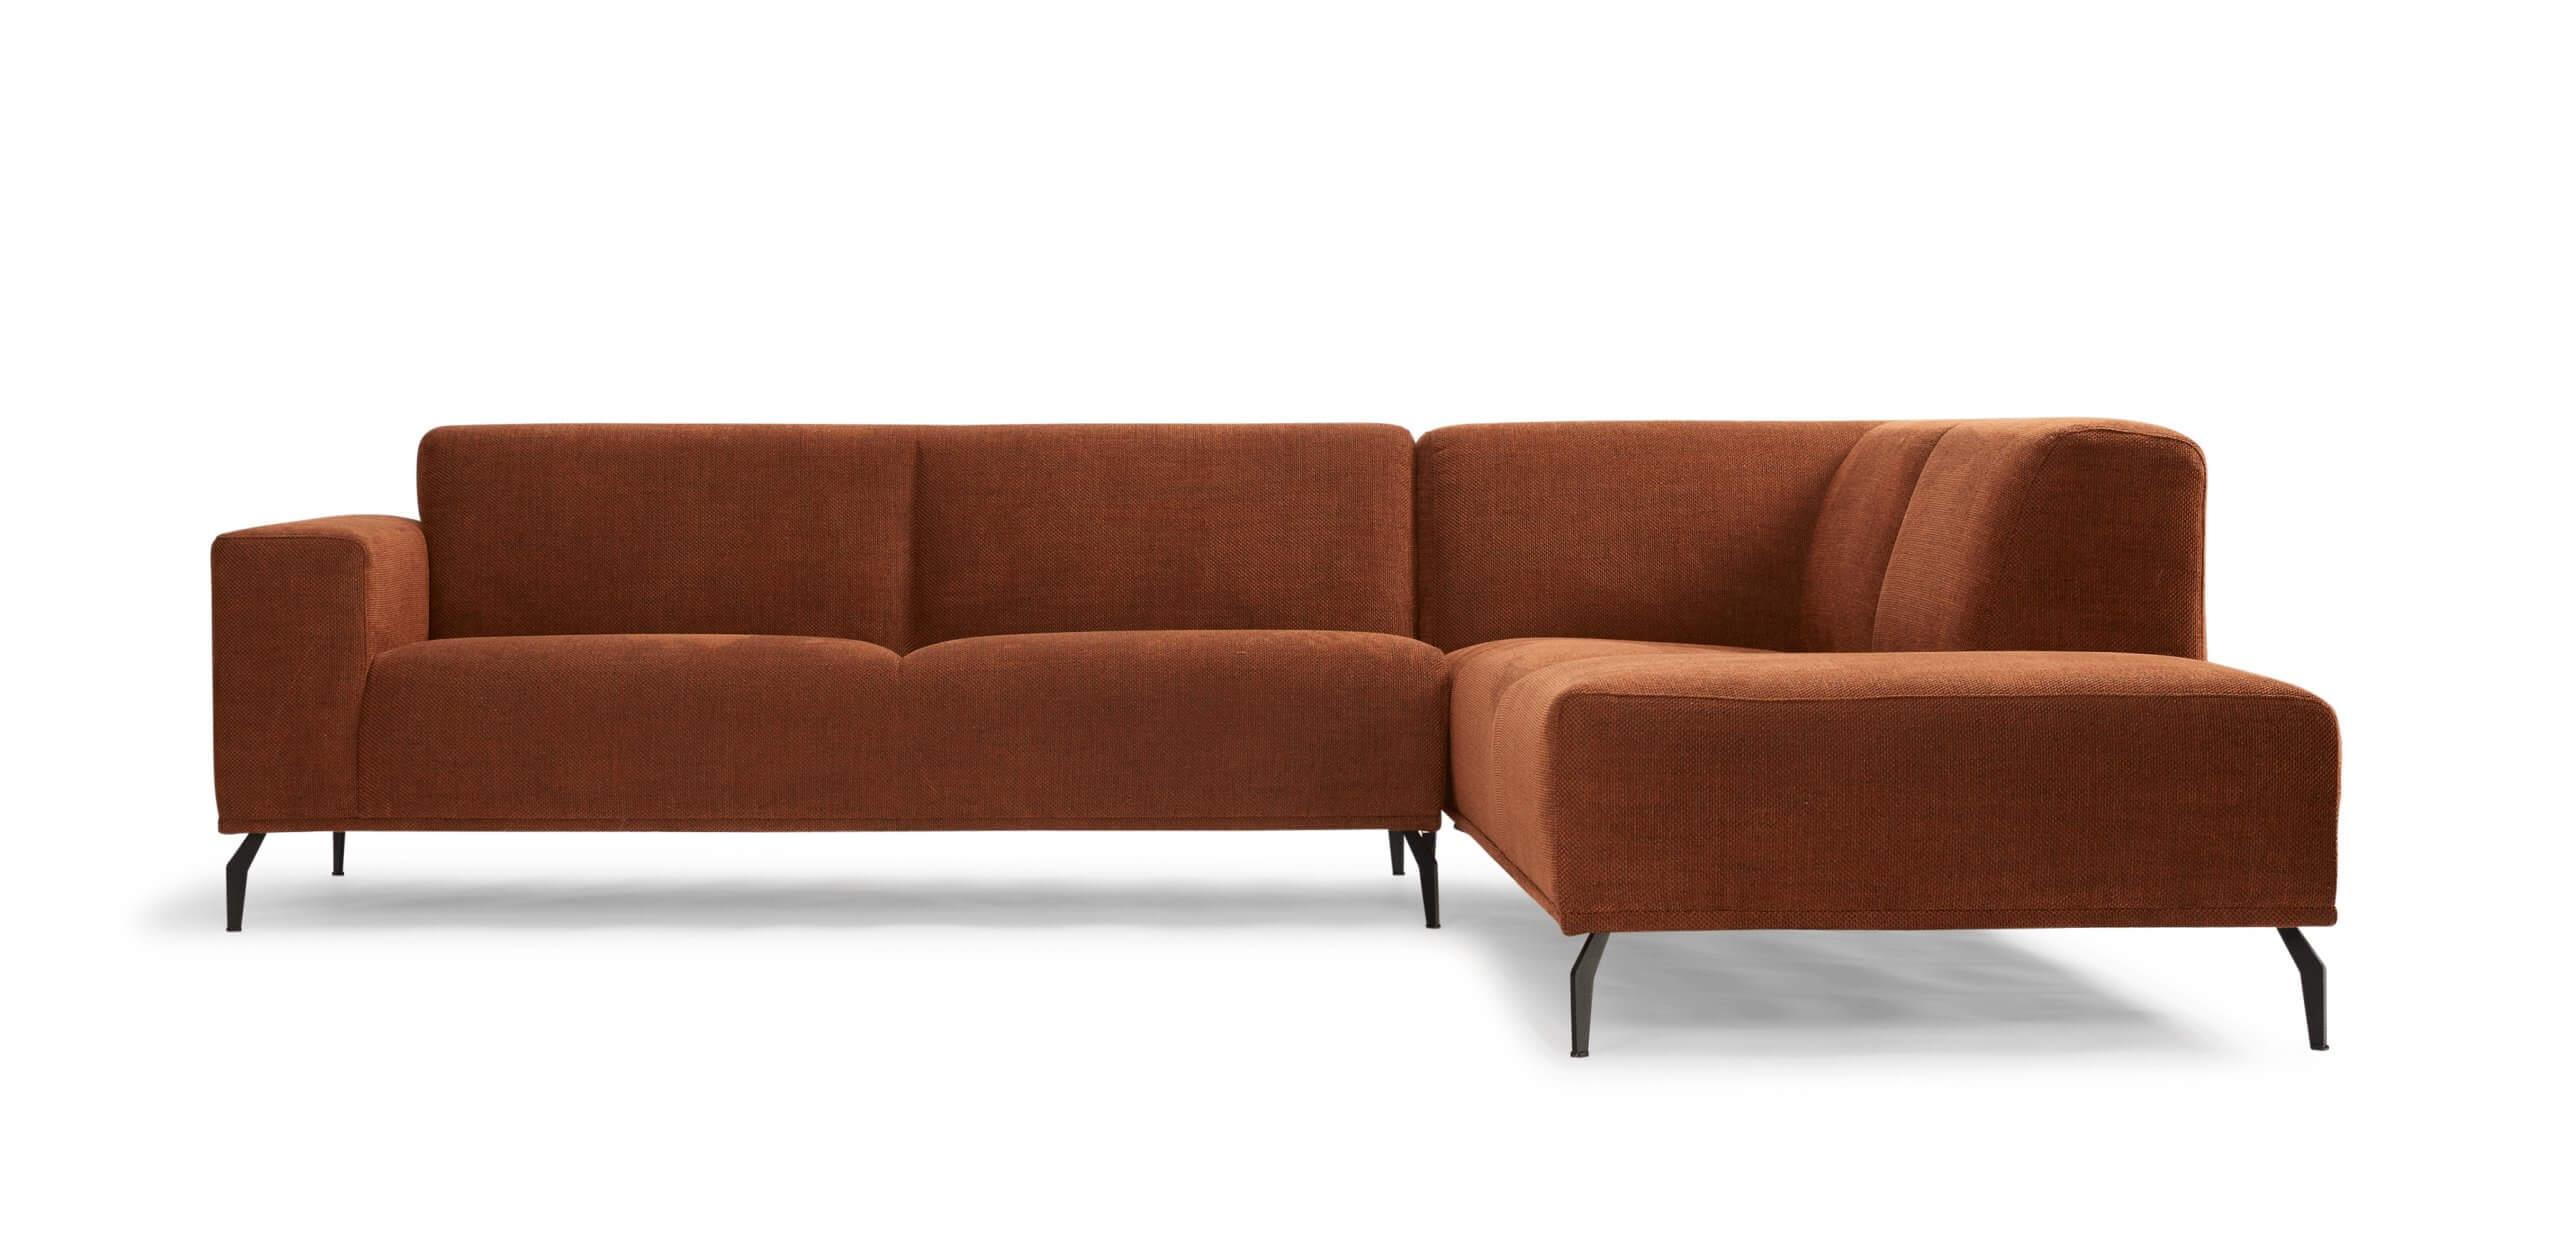 Pirlo-Silent-copper-126-DYYK-scaled